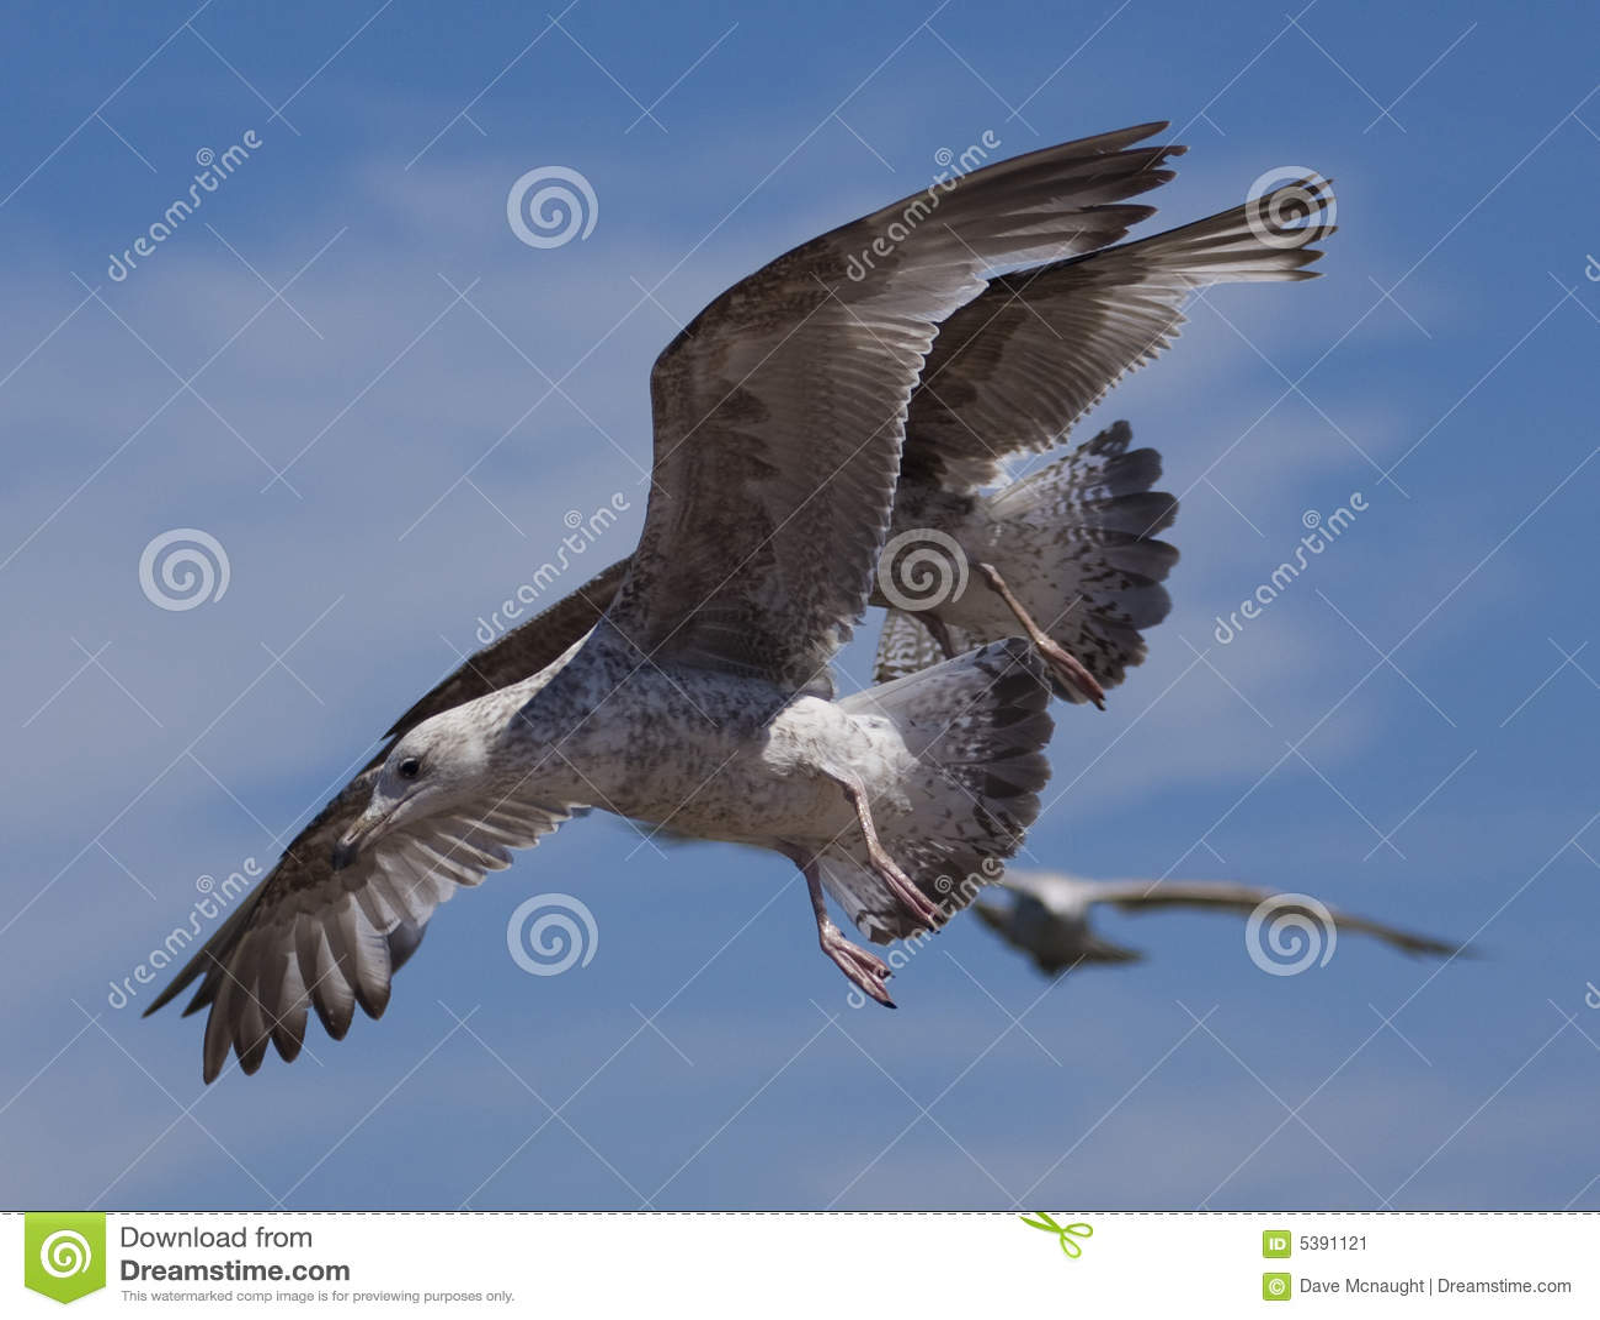 Seagull birds in flight